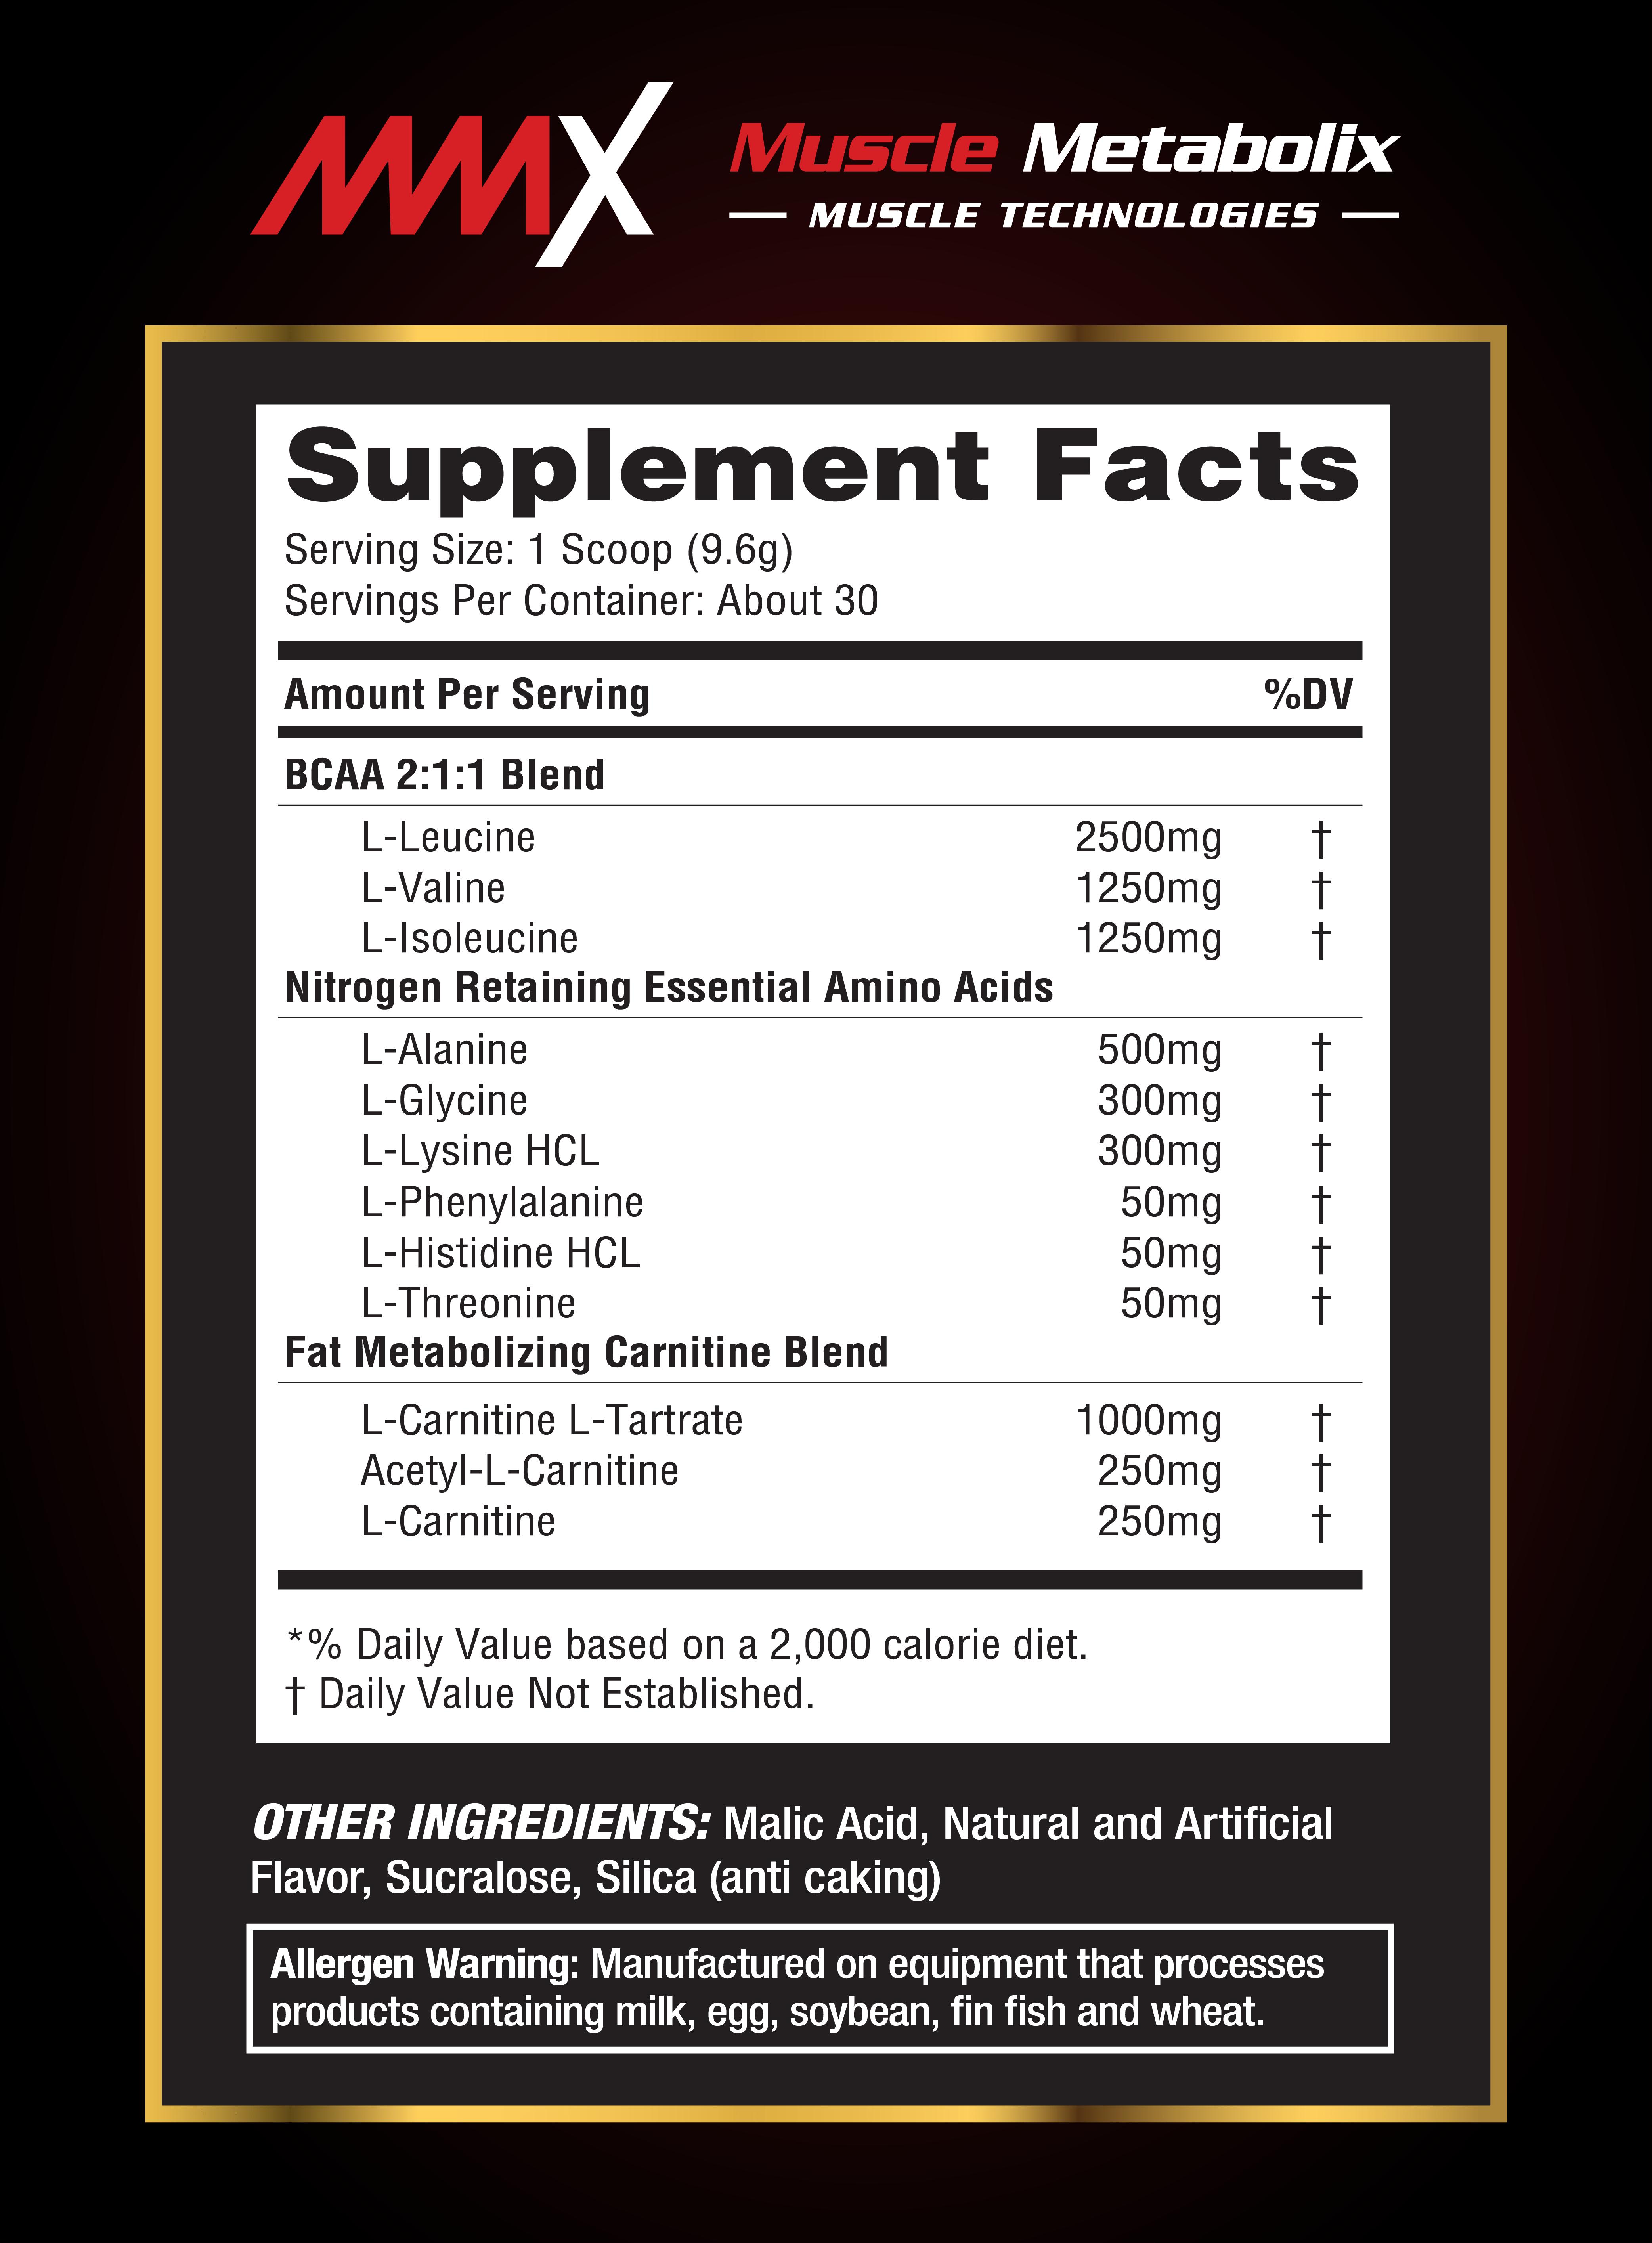 MMX Amino Shred, muscle, burn fat, kurus, slim, thin, body builder, gym, nutrition pro, supplement, sihat, improve energy, gymnast, cyclist, BCAA, kuat tiger, kuasa kuda